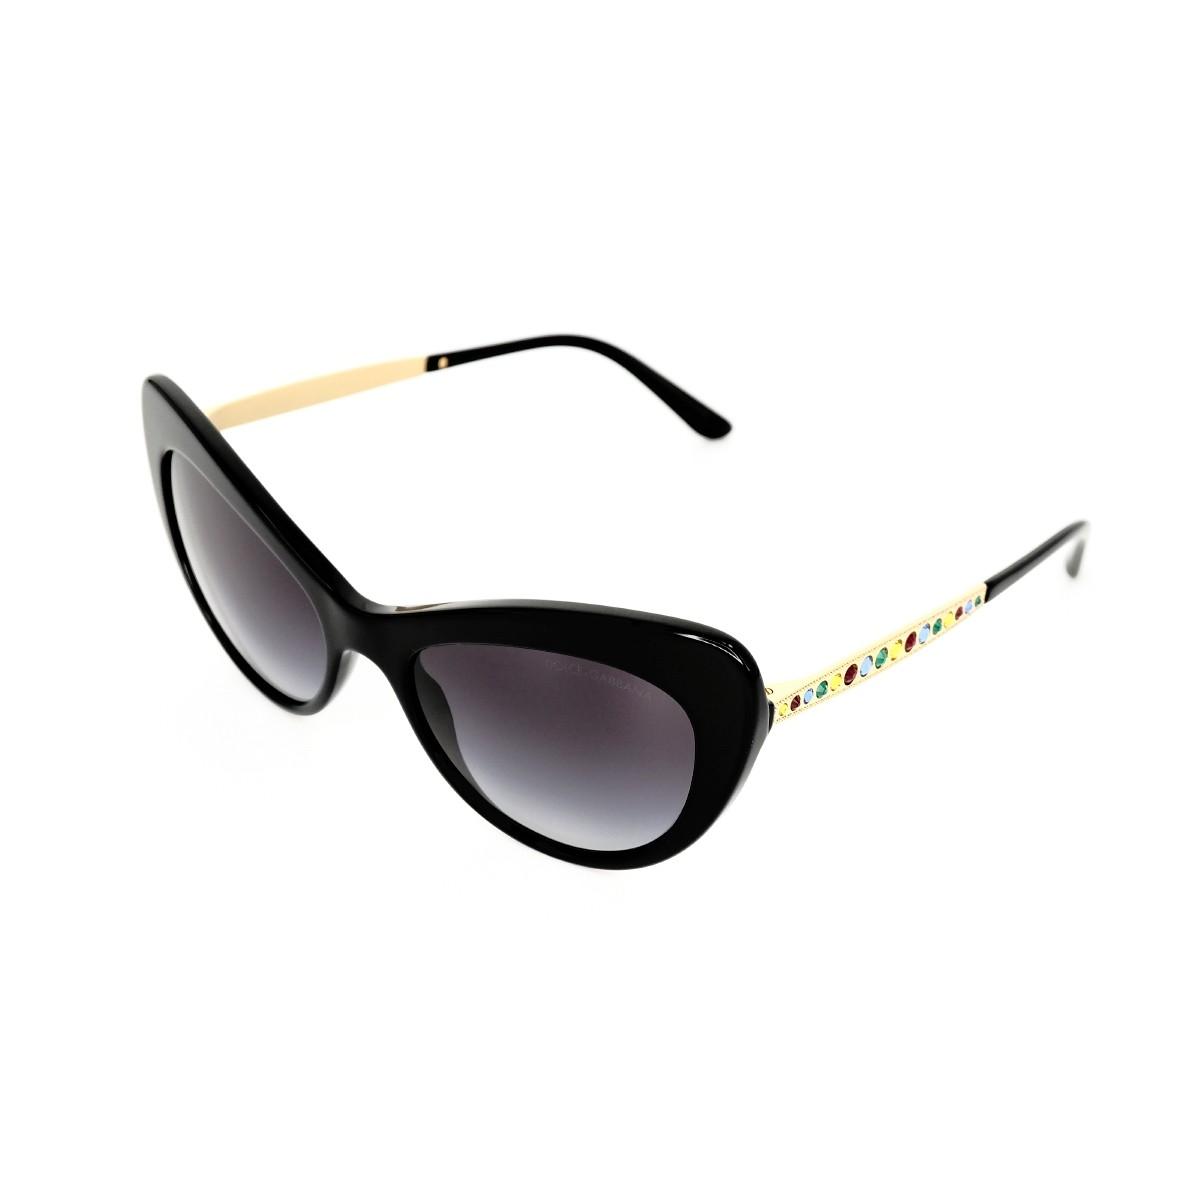 Dolce&Gabbana 4307B nero 501/8G, 184,00€, Occhiali Dolce&Gabbana Nero a forma Gatto